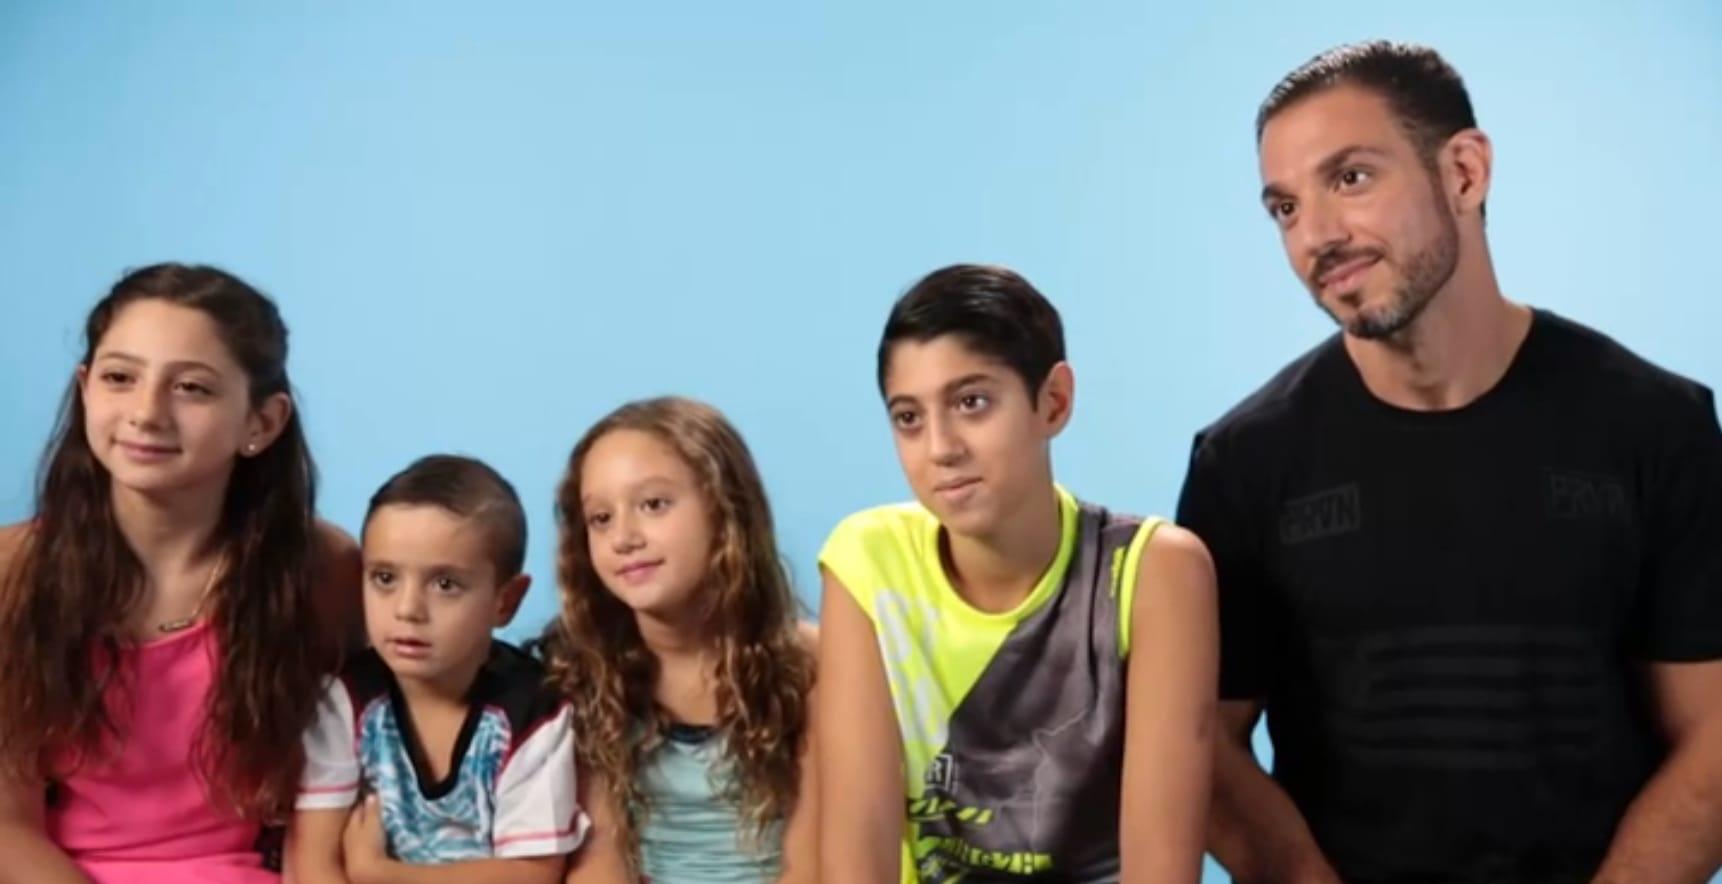 Kids Explaining CrossFit